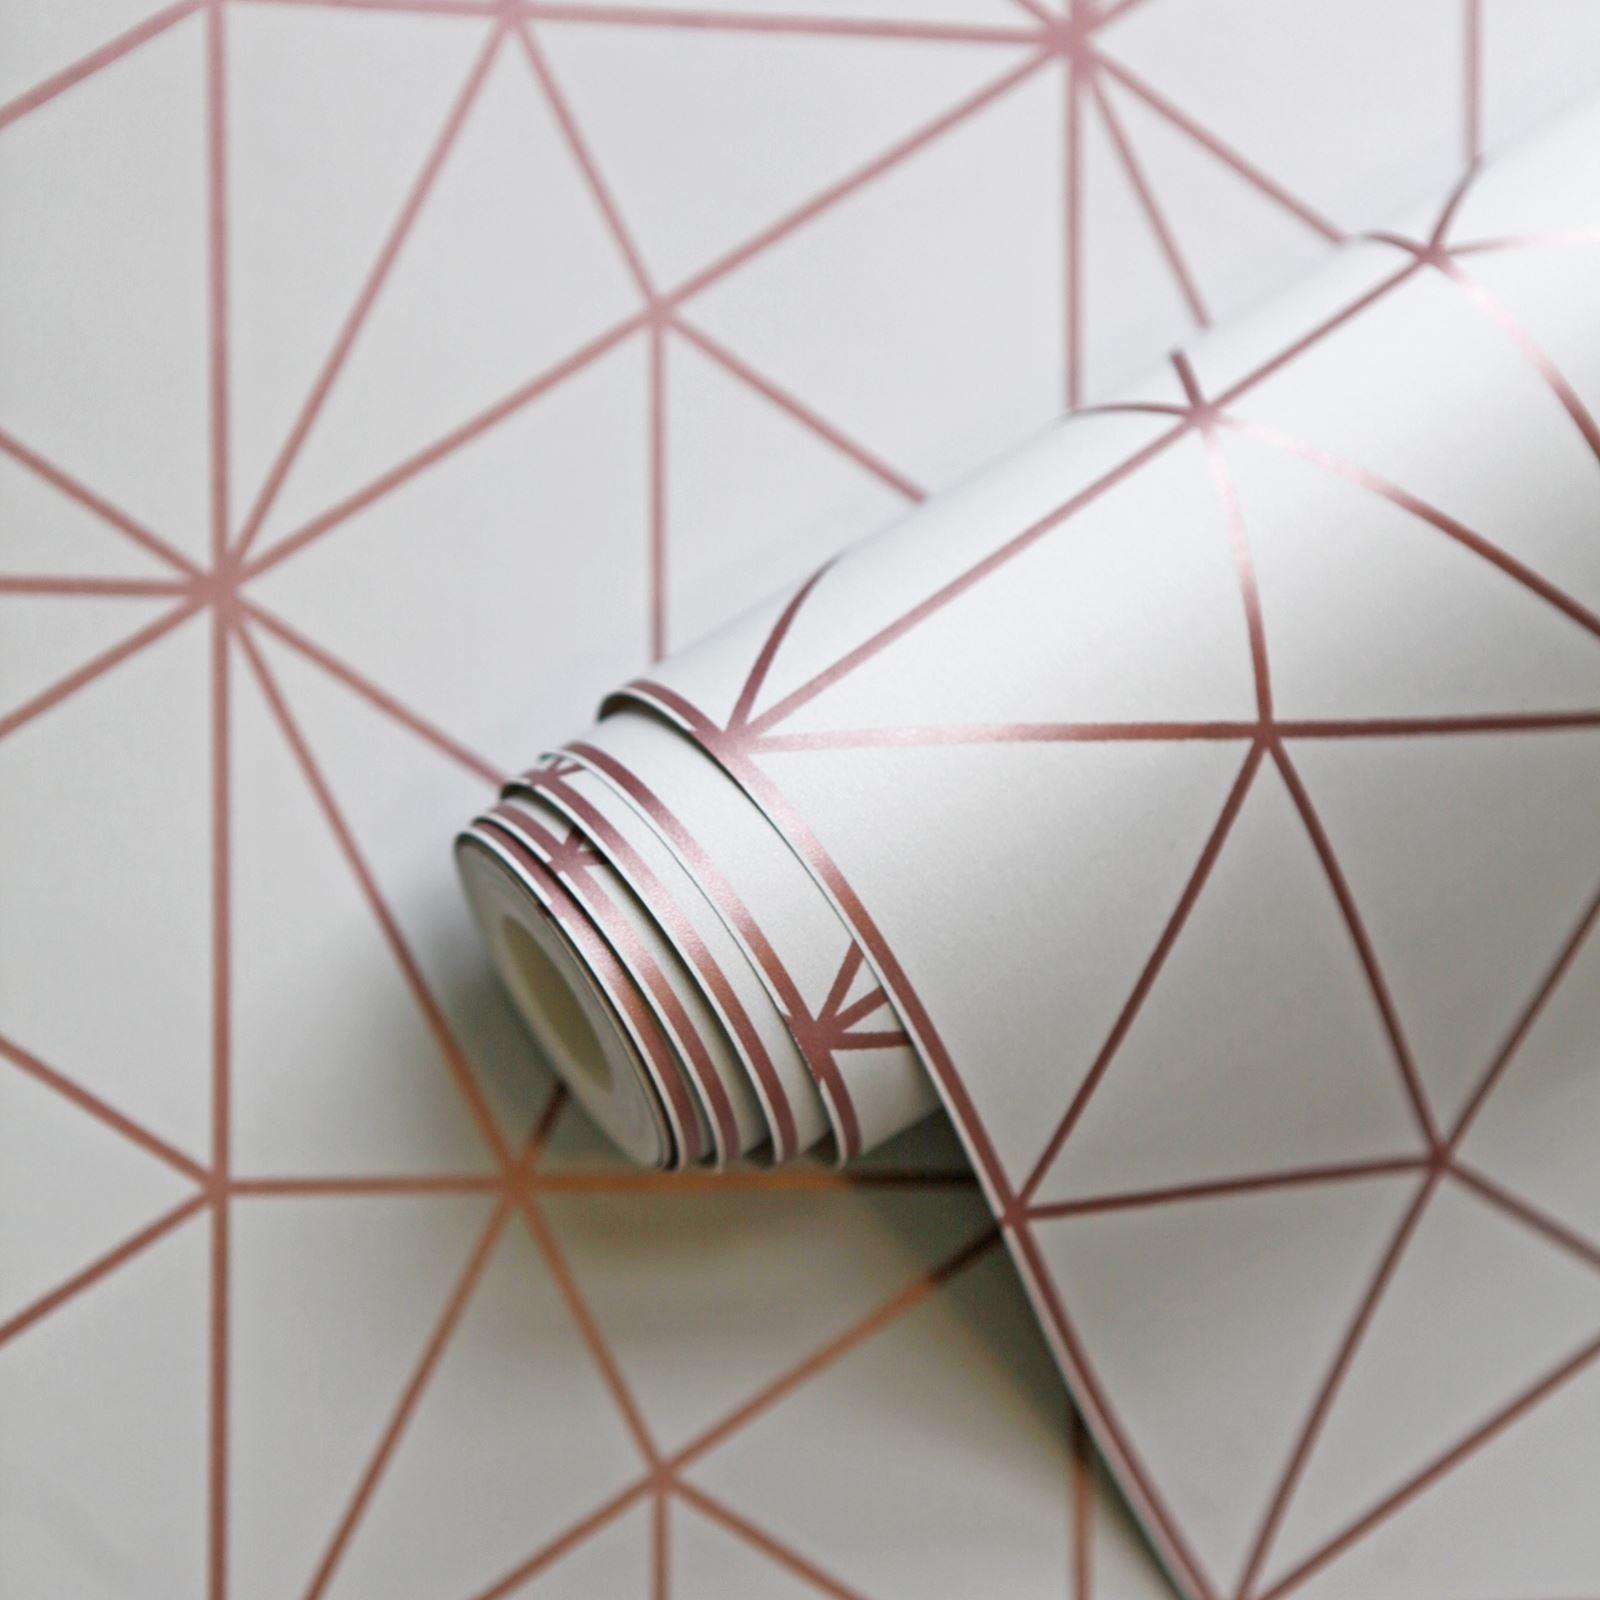 miniatura 132 - Carta da Parati Geometrica Arredamento Camera Moderno Vari Disegni e Colori